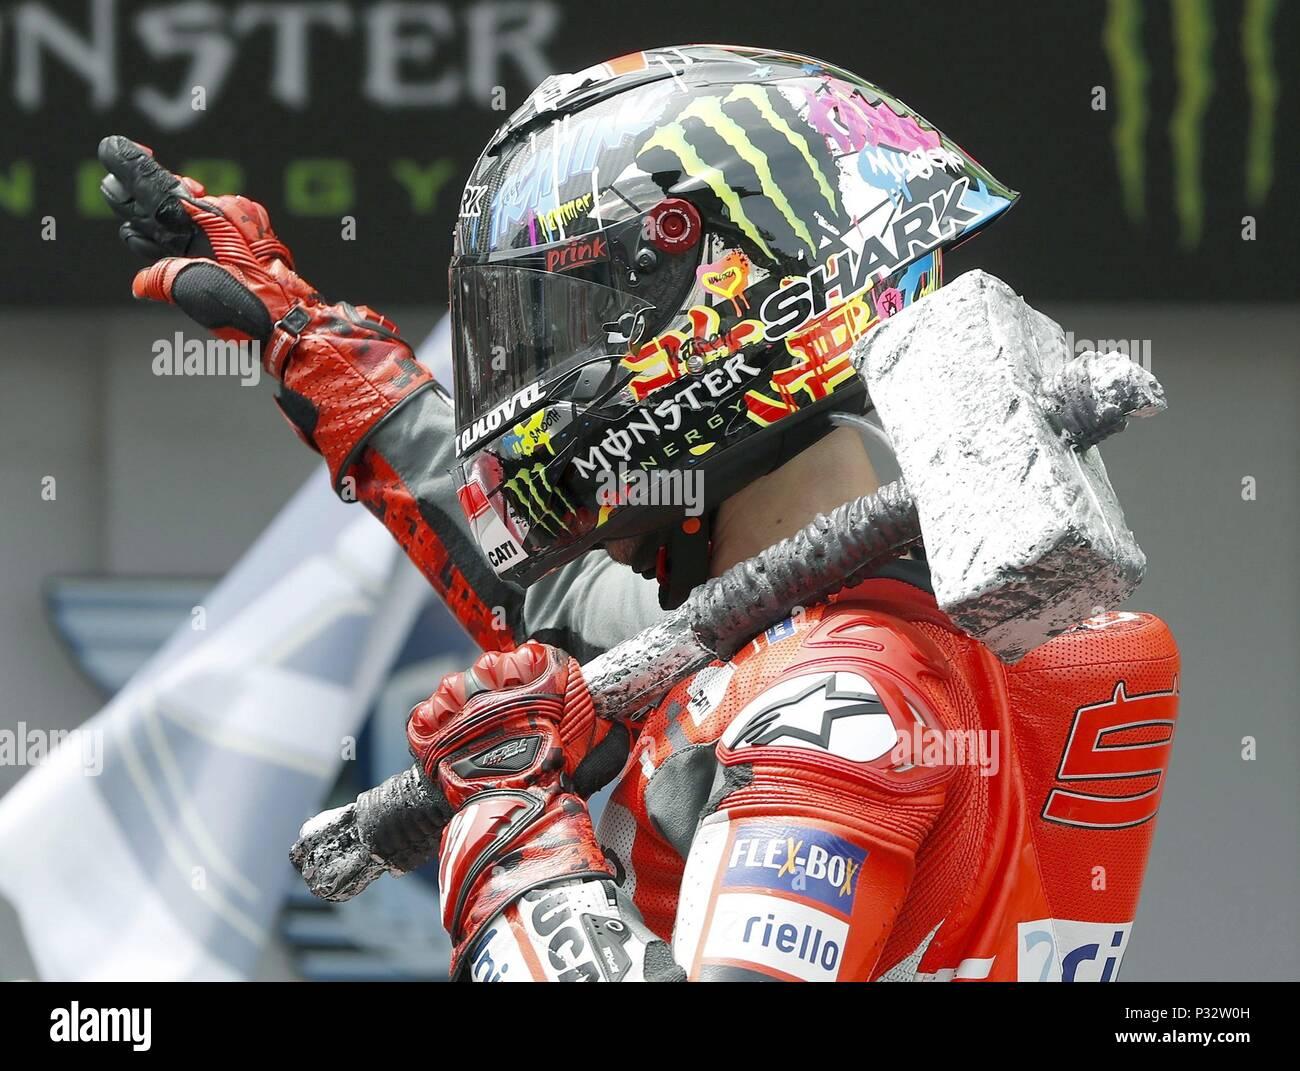 Barcelona Spain 17 June 2018 Spanish Motogp Rider Jorge Lorenzo